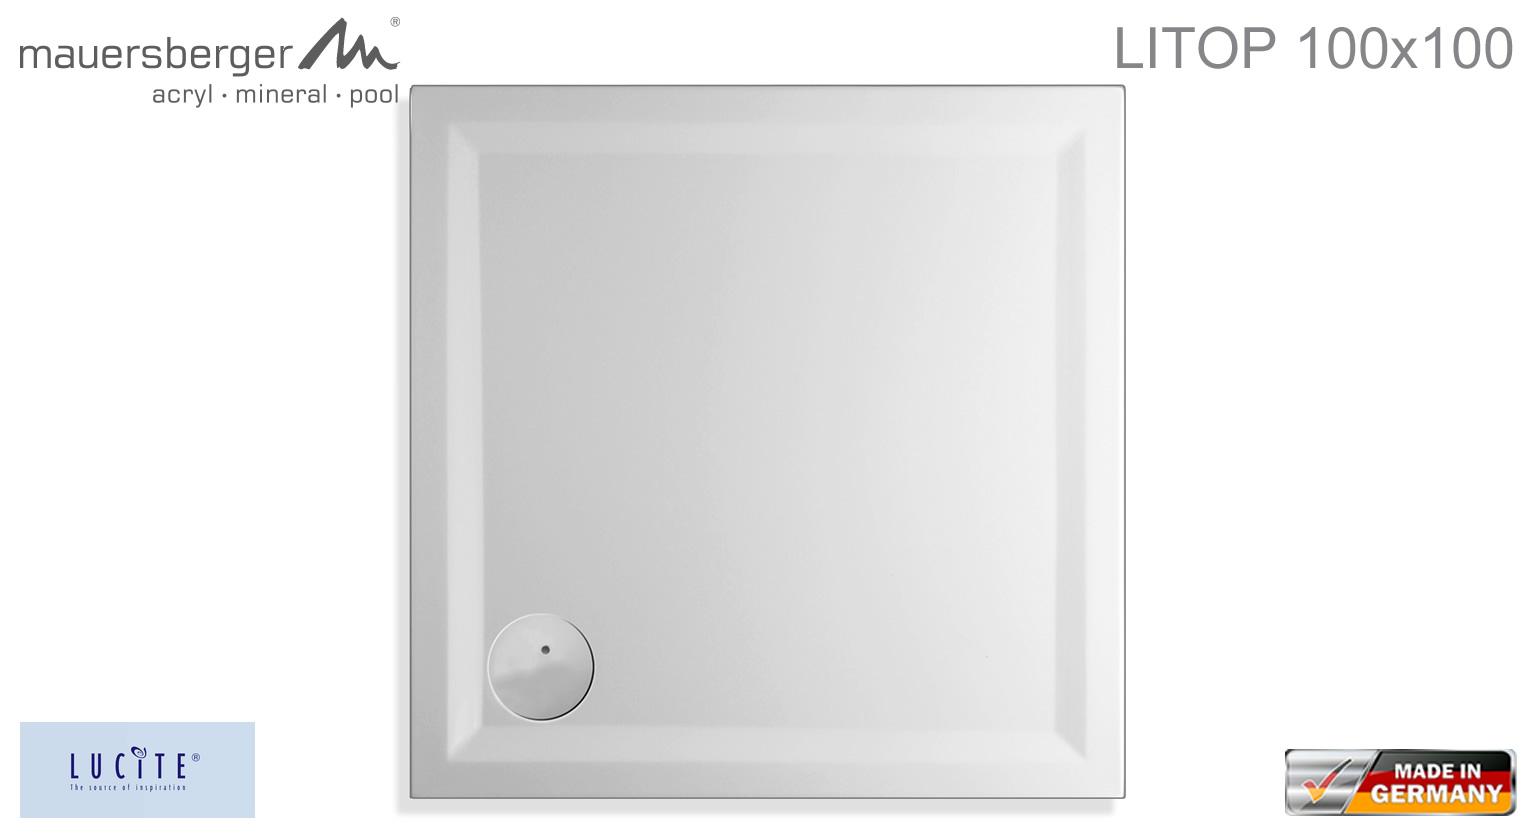 mauersberger duschwanne litop 100 x 100 cm superflach. Black Bedroom Furniture Sets. Home Design Ideas